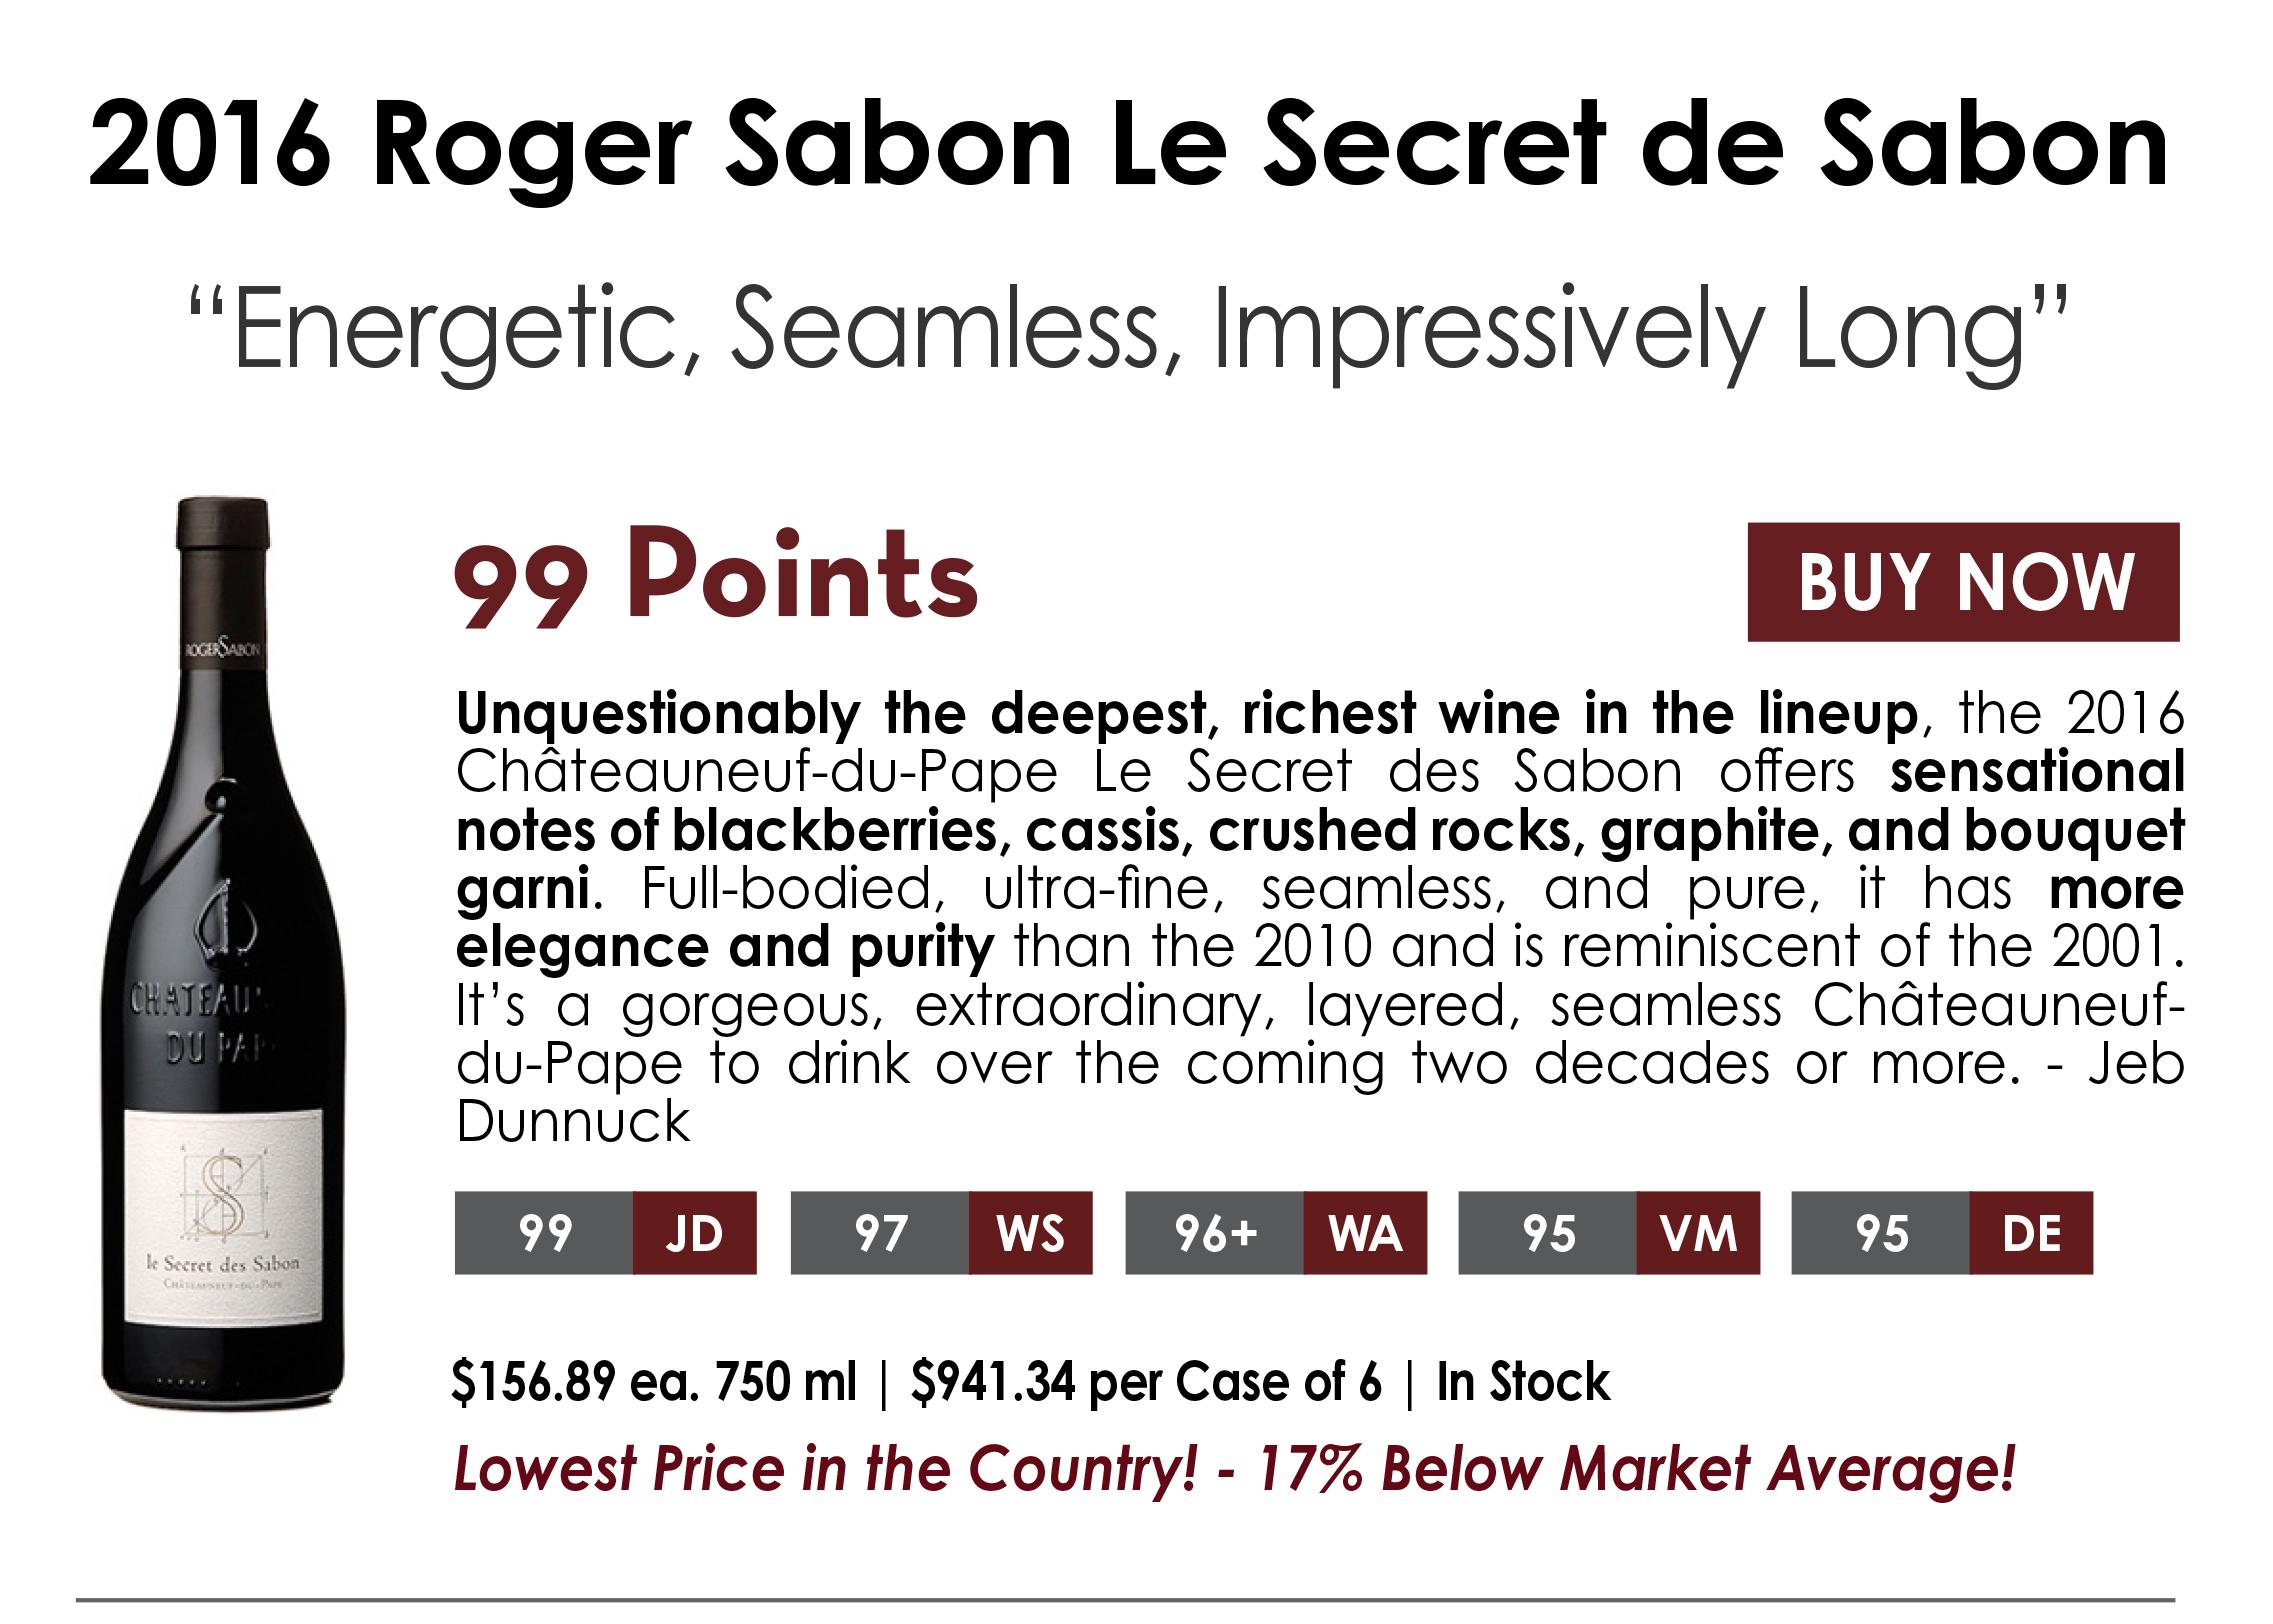 2016-roger-sabon-le-secret-de-sabon-cdp-proof-01.jpg